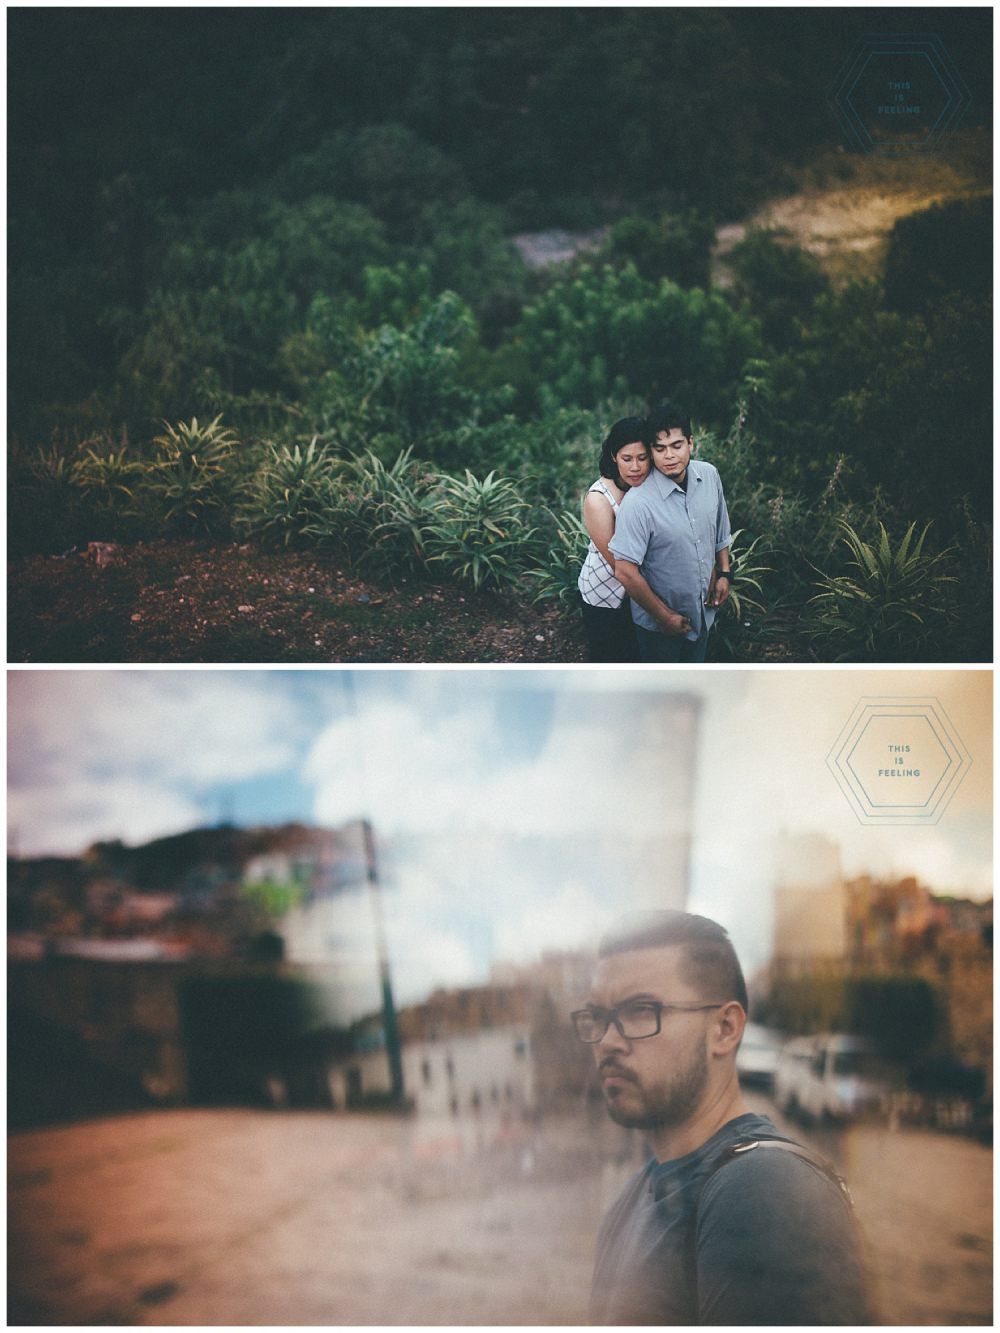 0002-20140820_1527_B41_3557-thisisfeeling-photography-chicago-destination-wedding-Guanajuato-bocamina-san-ramon Thisisfeeling Photography heads to Mexico